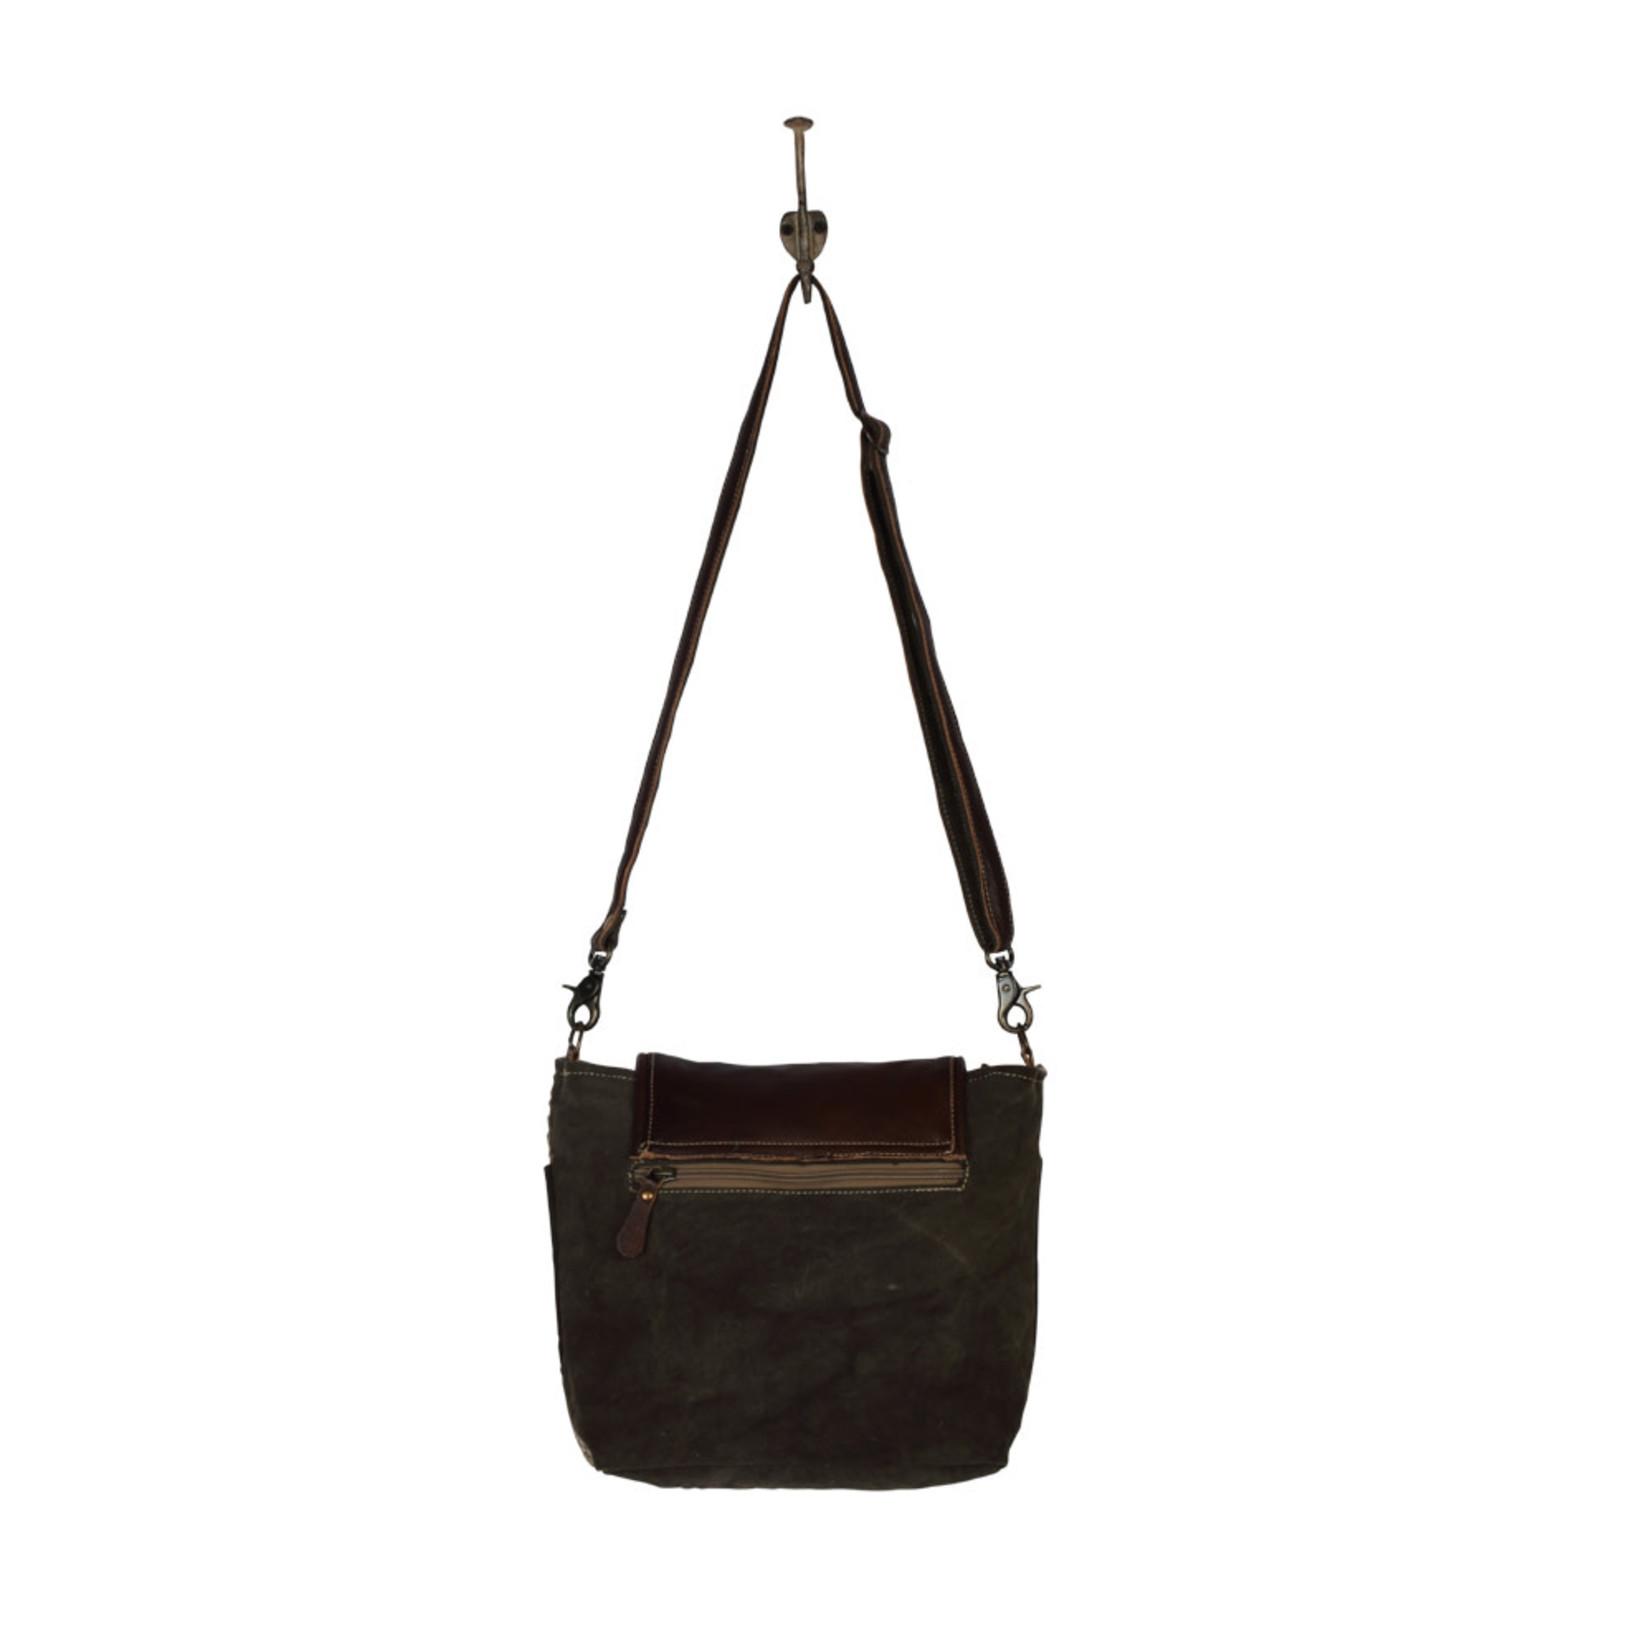 Myra Bags S-2107 Rough Hewn Small & Crossbody Bag